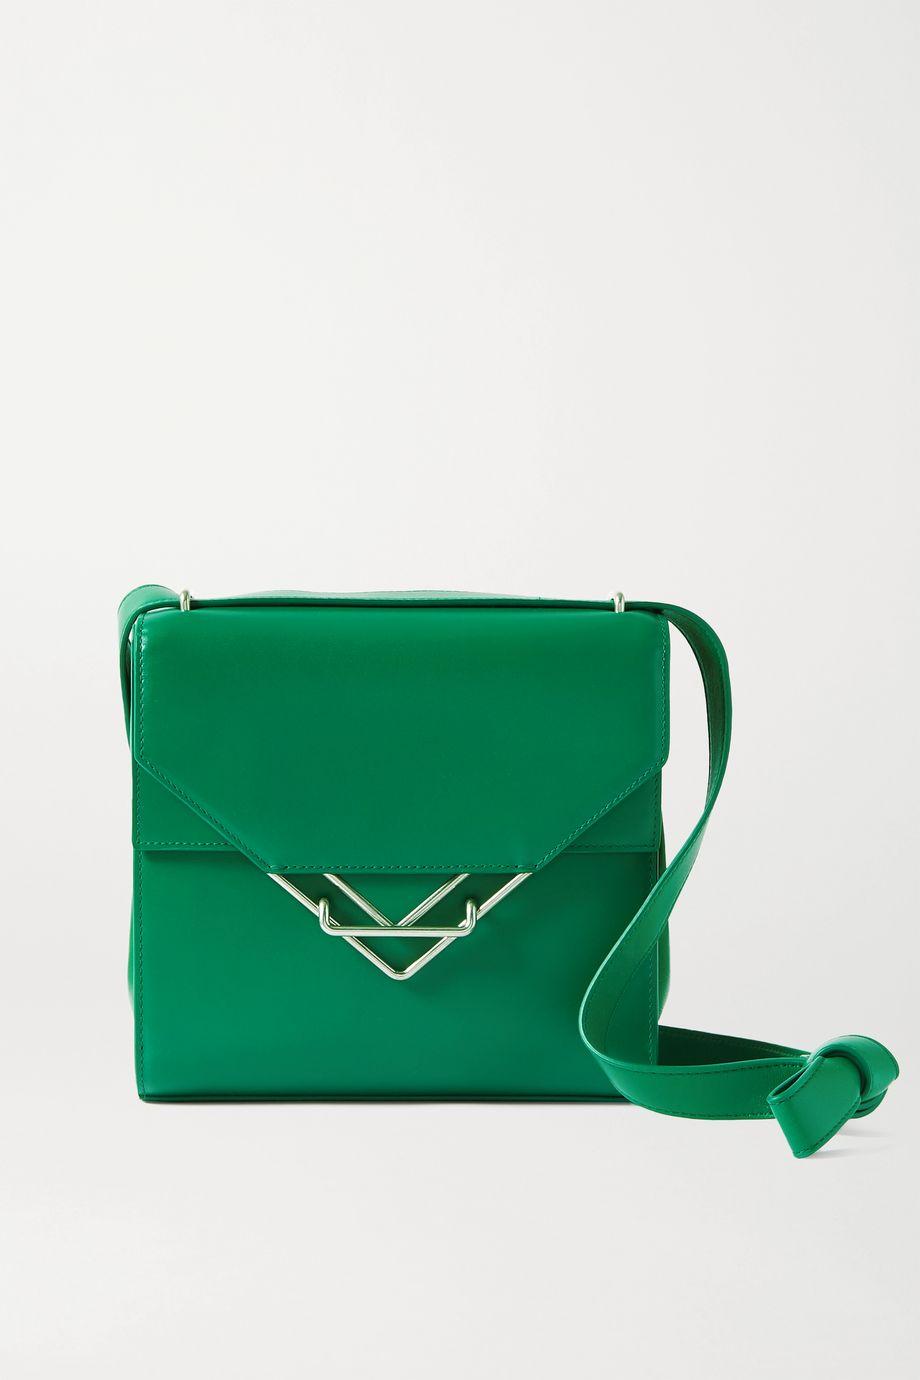 Bottega Veneta The Clip small leather shoulder bag